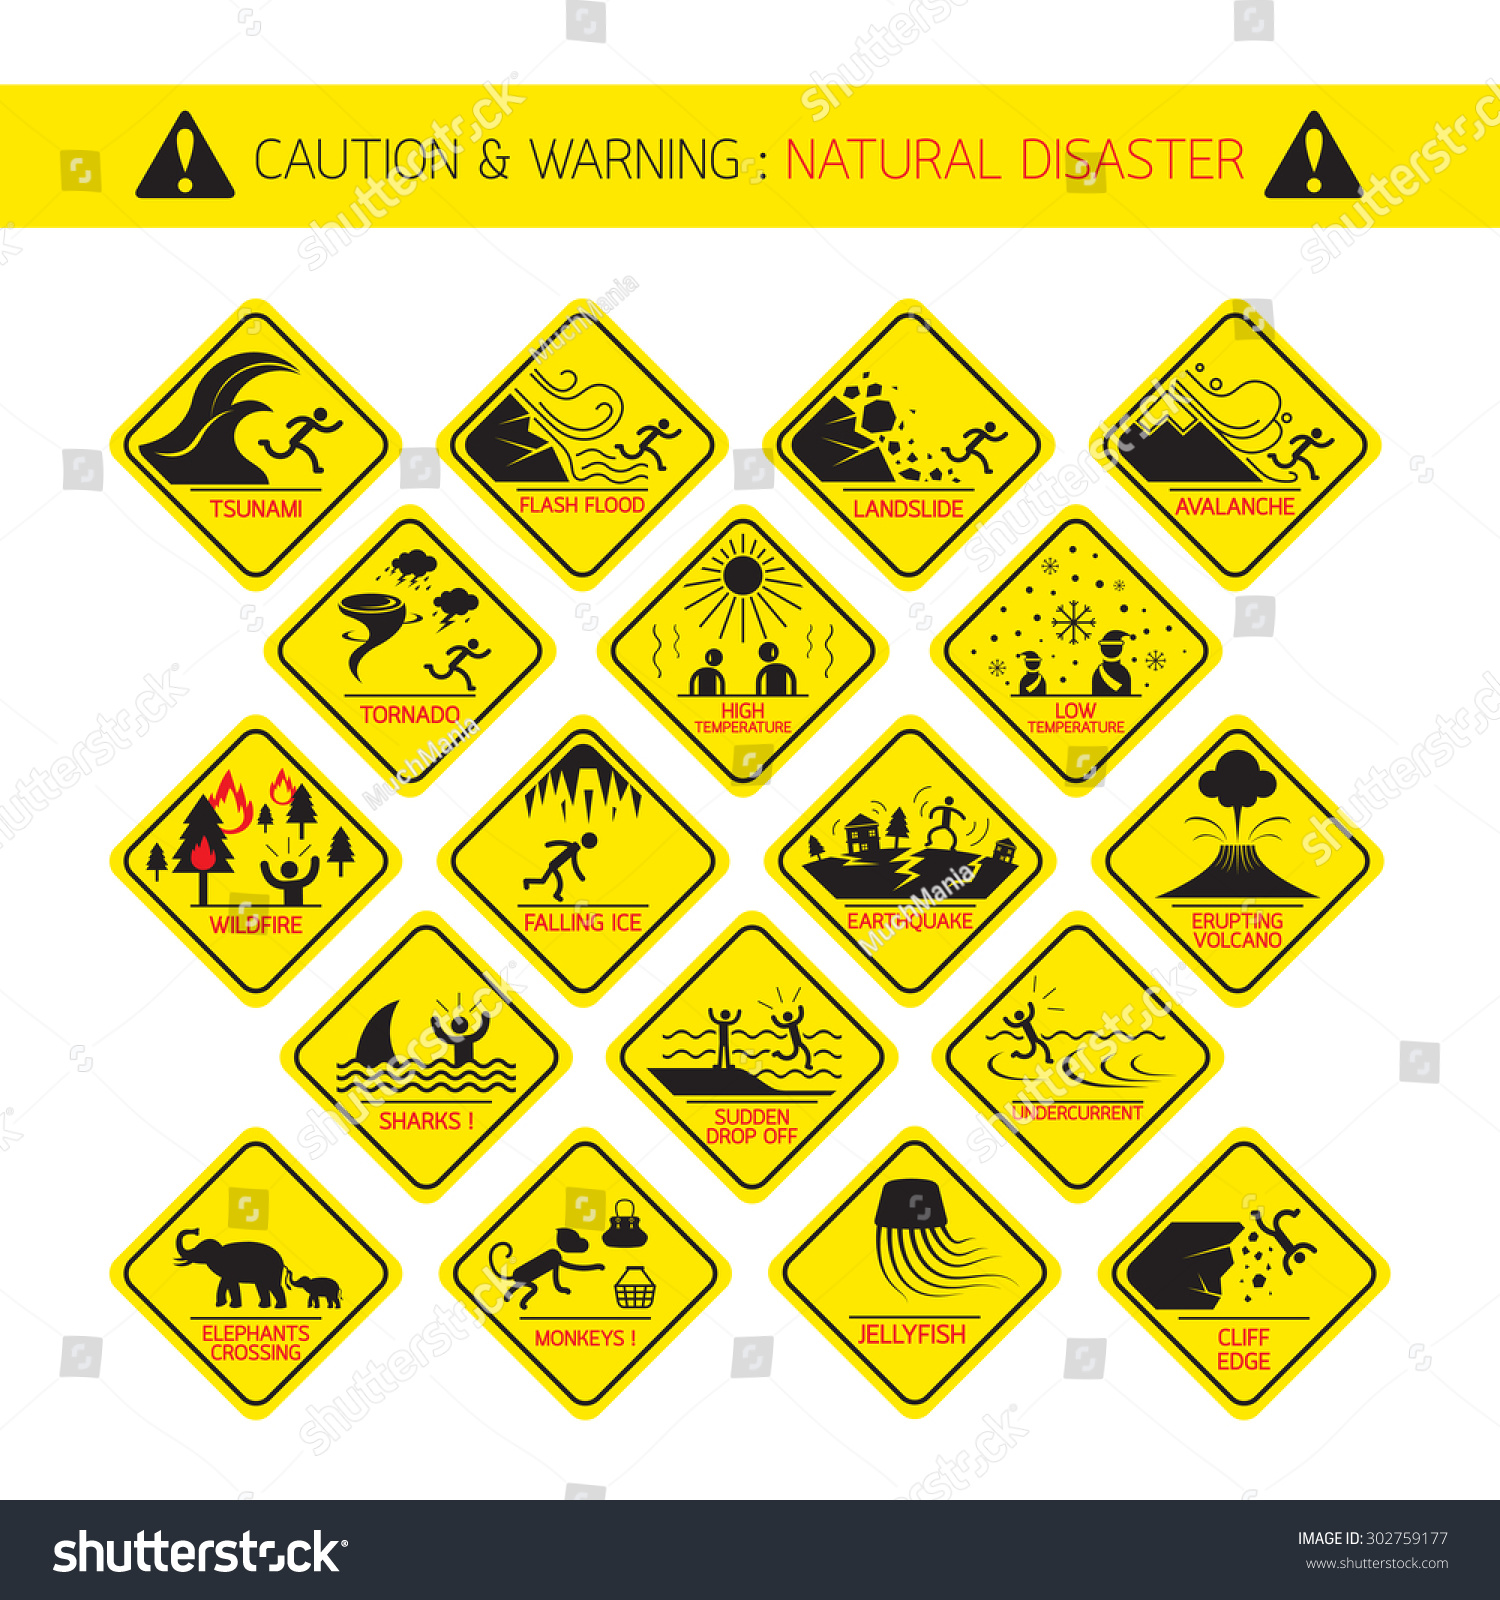 Natural Disaster Warning Signs Caution Danger Stock Vector Royalty